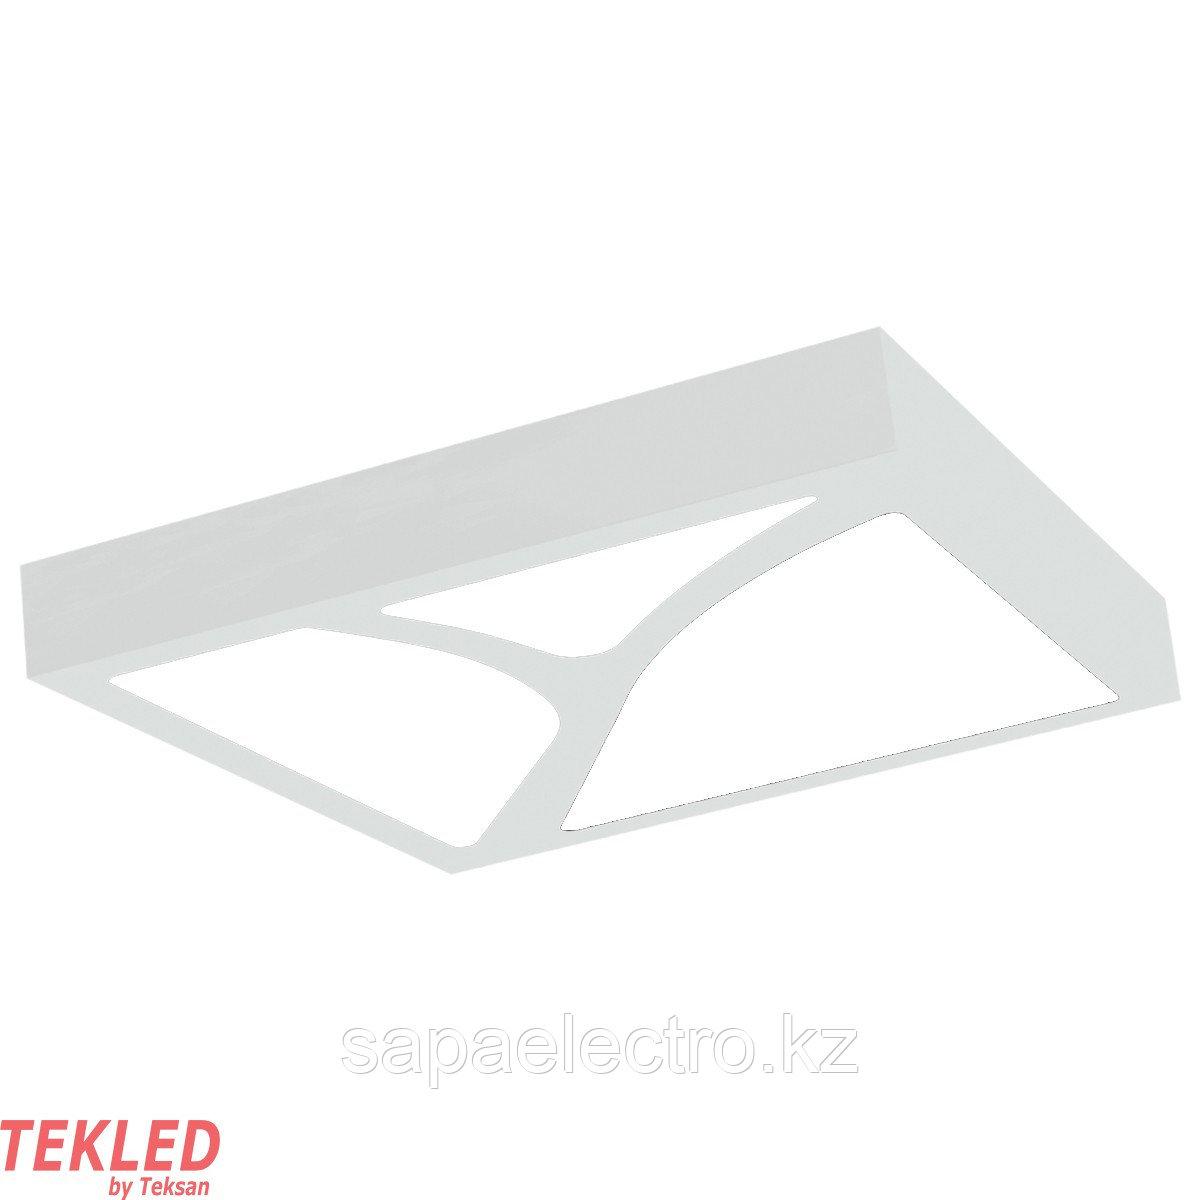 Св-к  OPALLED MARBLE 48W WH S/U  600x600 5700K  MGL